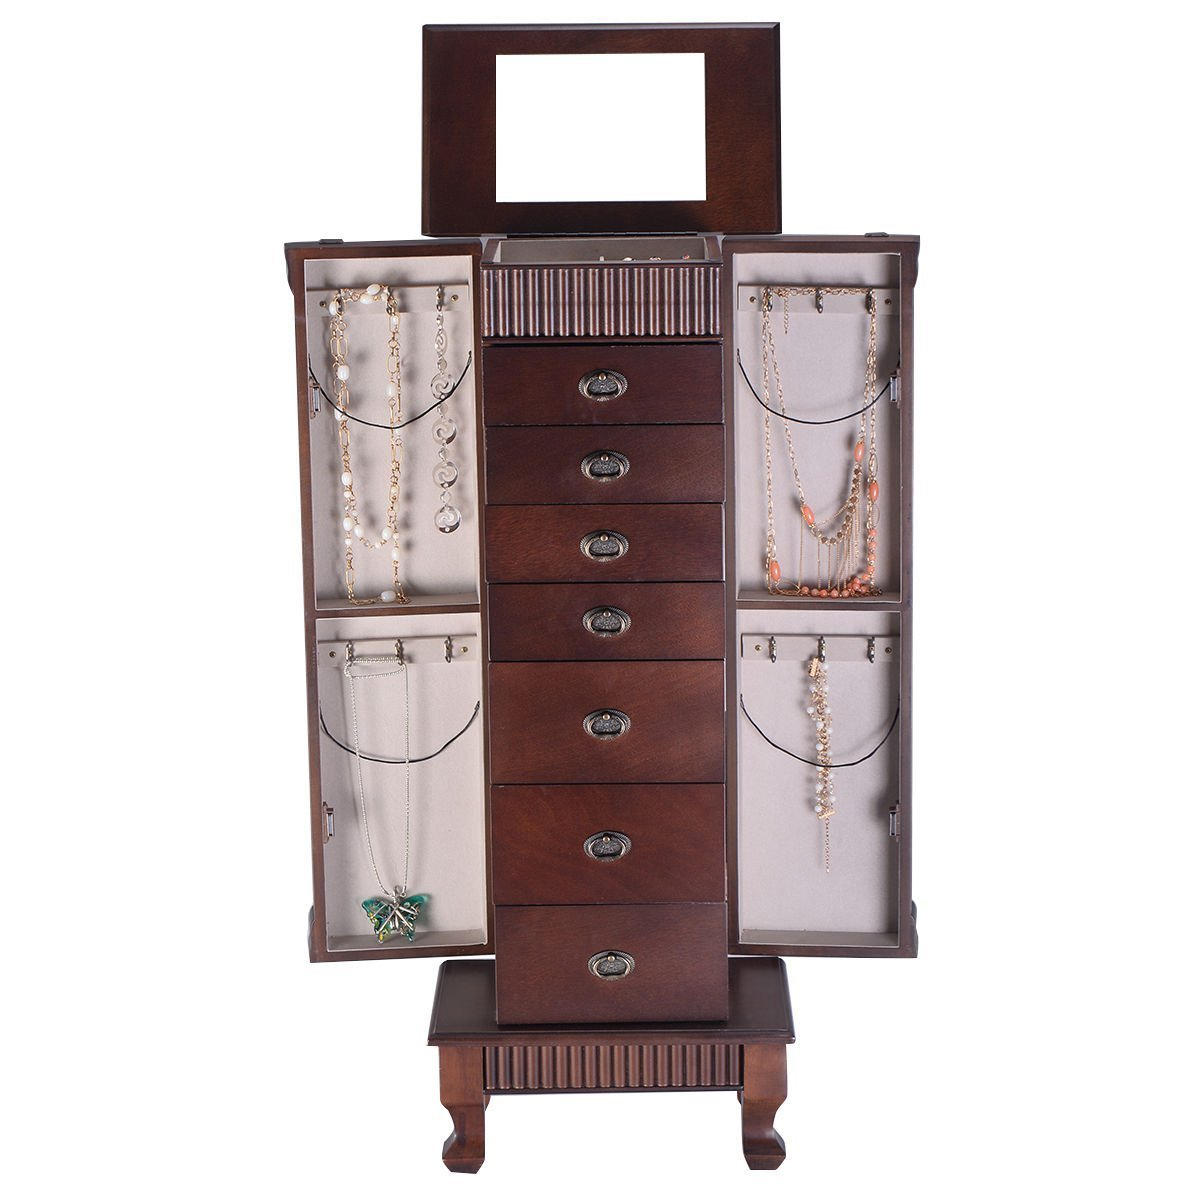 (US Stock) Jewery Armoire Jewelry Cabinet Box Storage Chest Necklace Wood Walnut Stand Organizer (Brown)